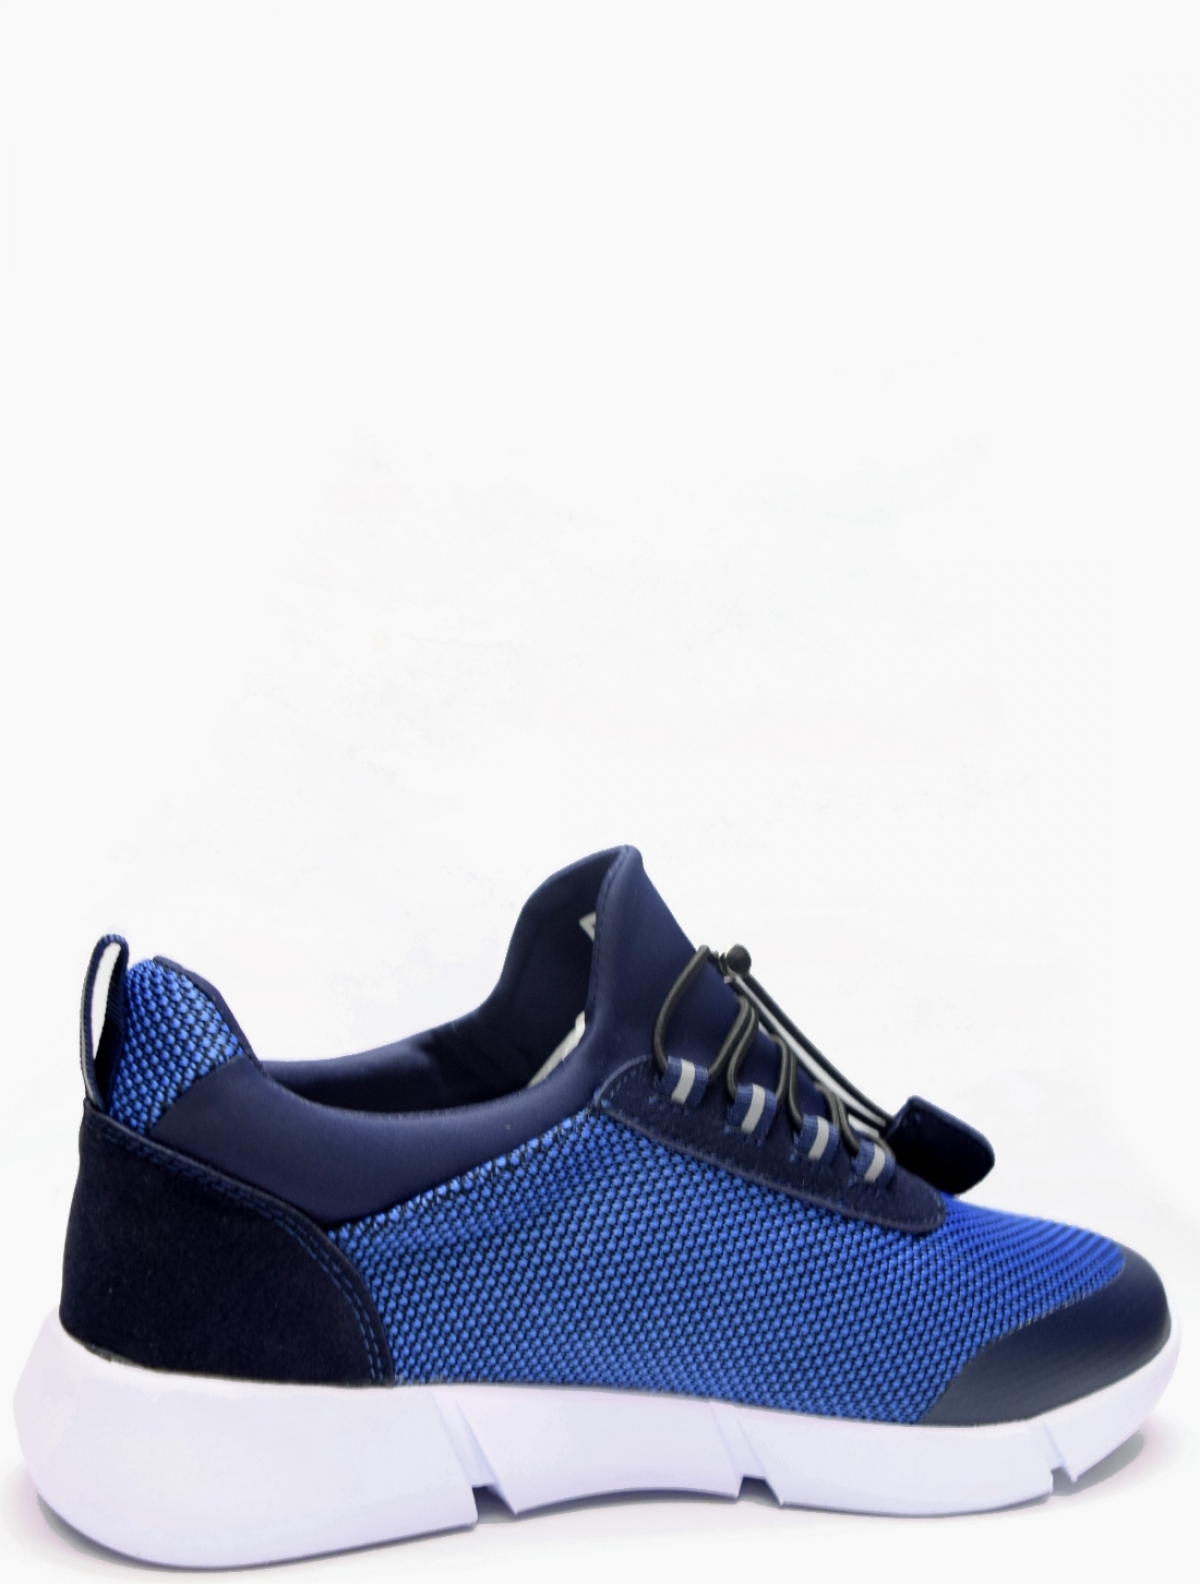 Зебра 13075-5 мужские кроссовки